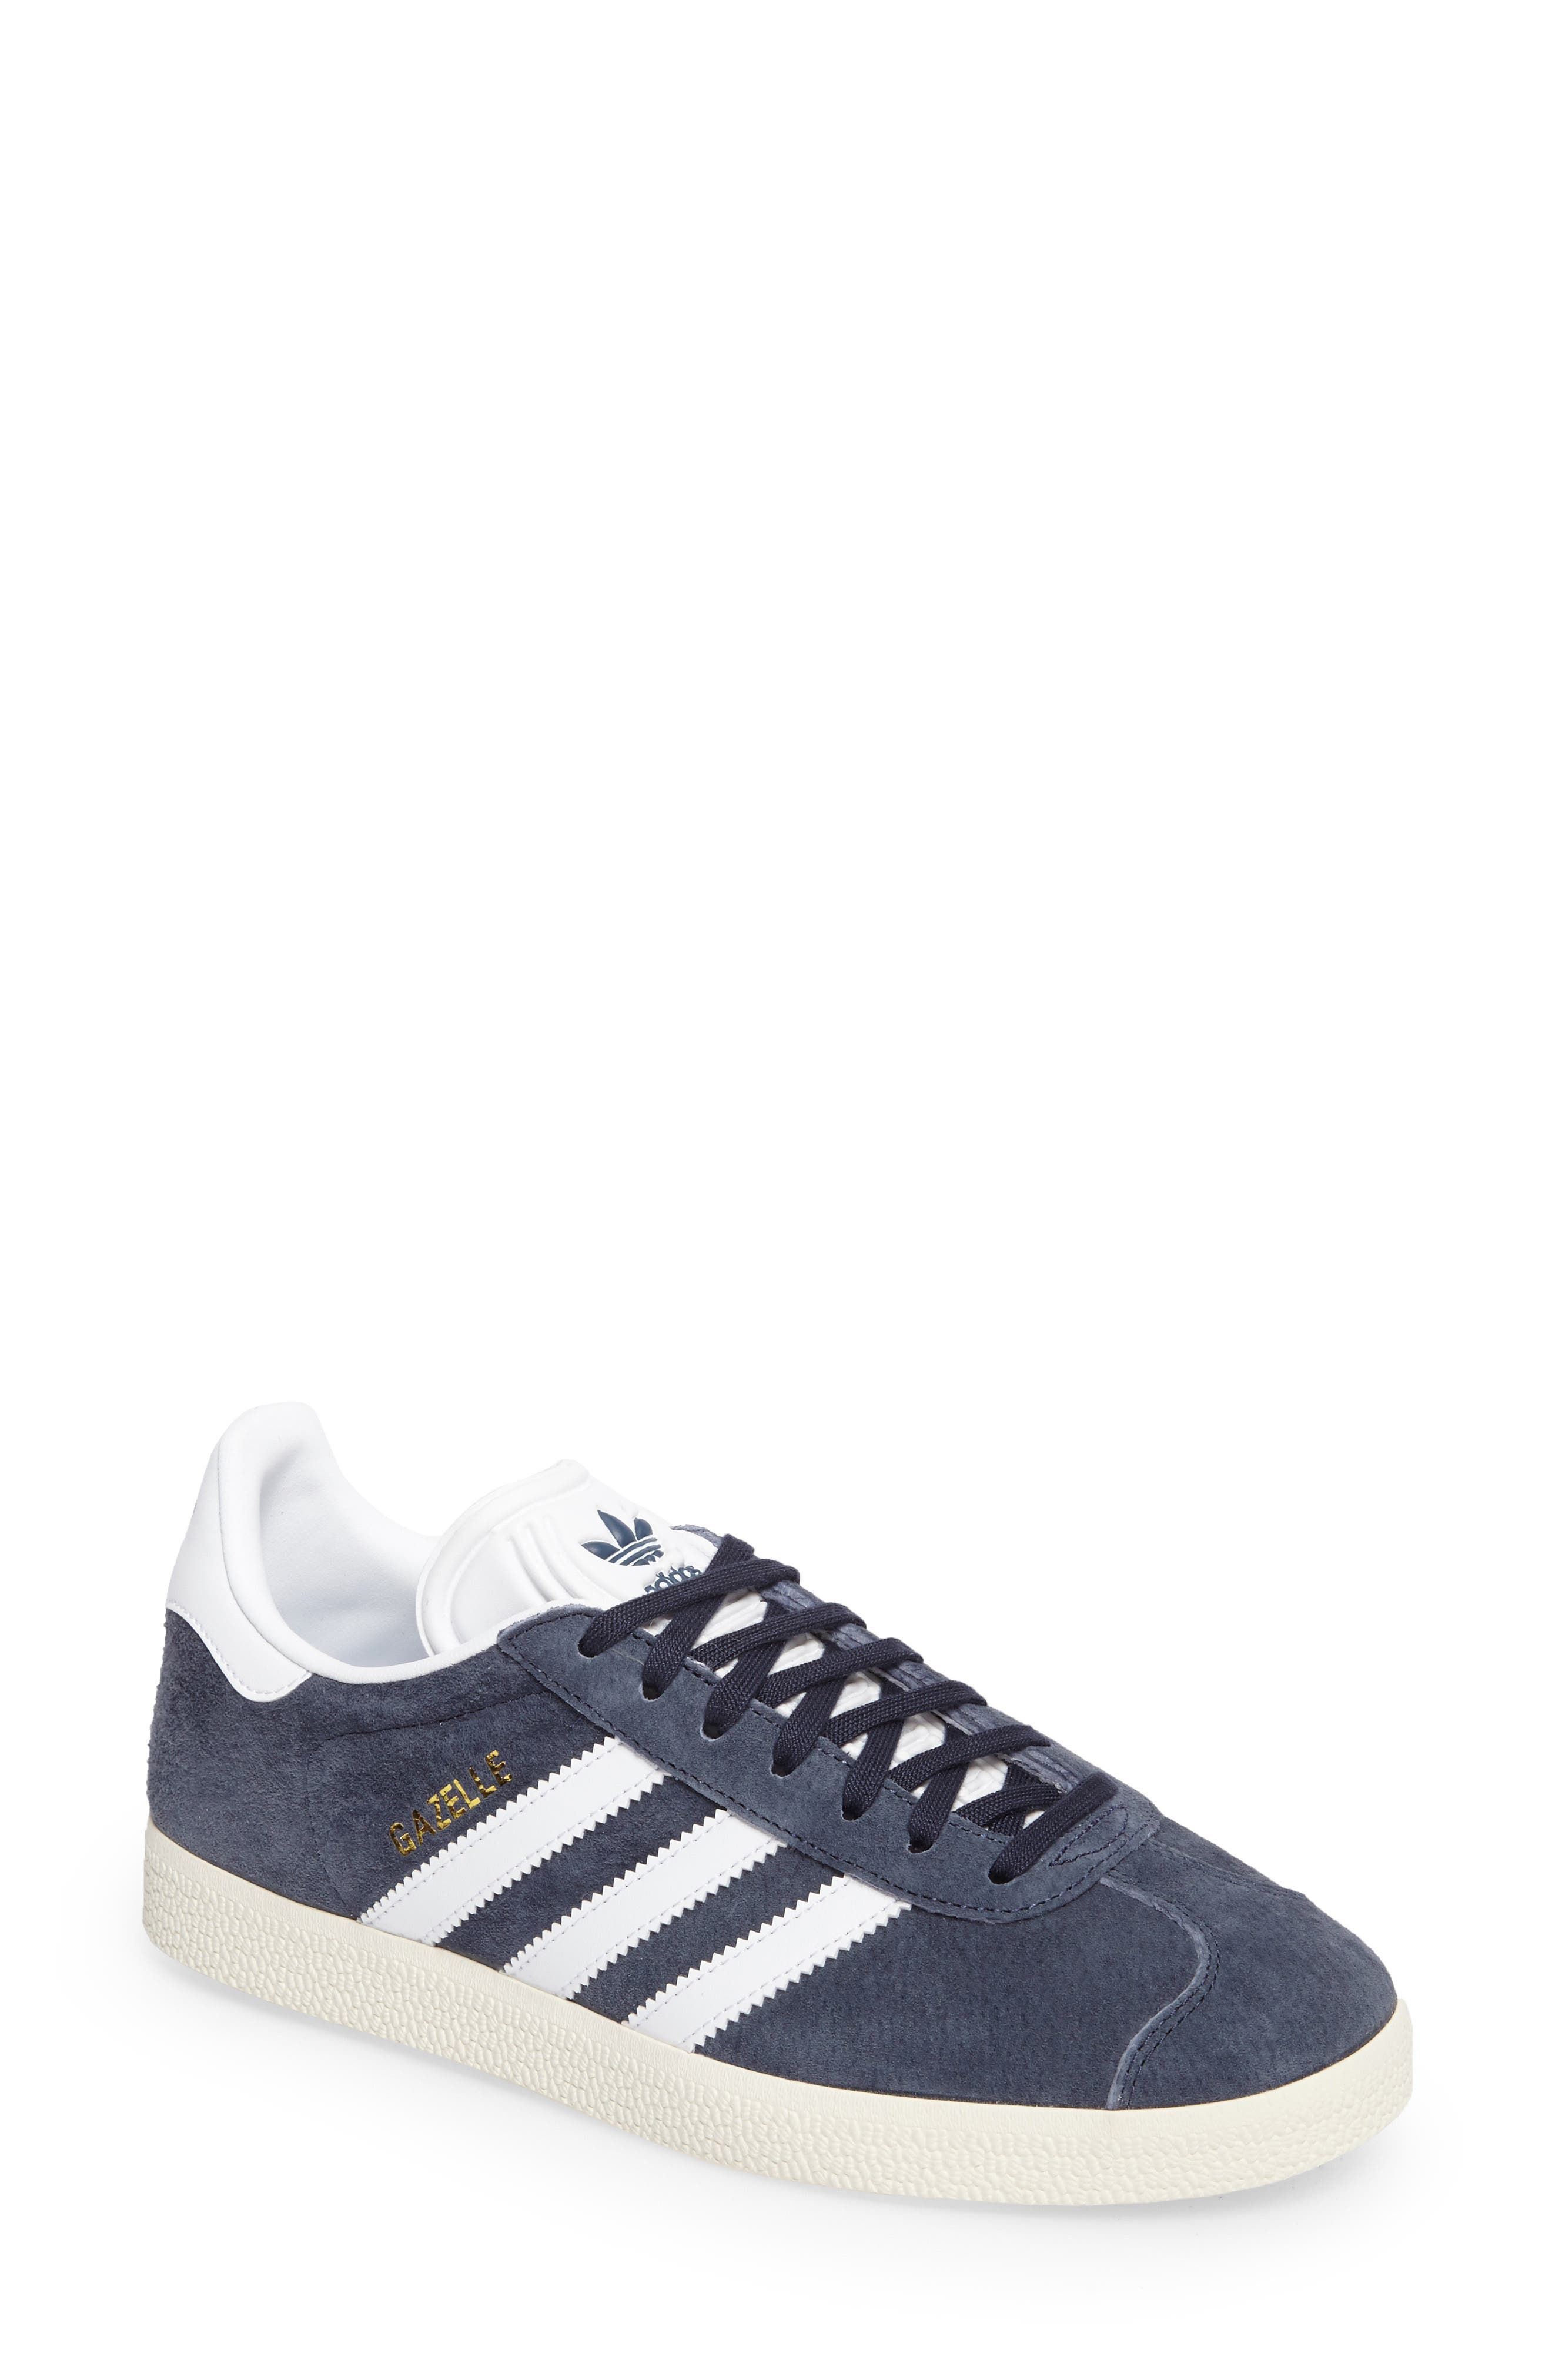 Main Image - adidas Gazelle Sneaker. Core Black swatch image Trace Blue/  White ...